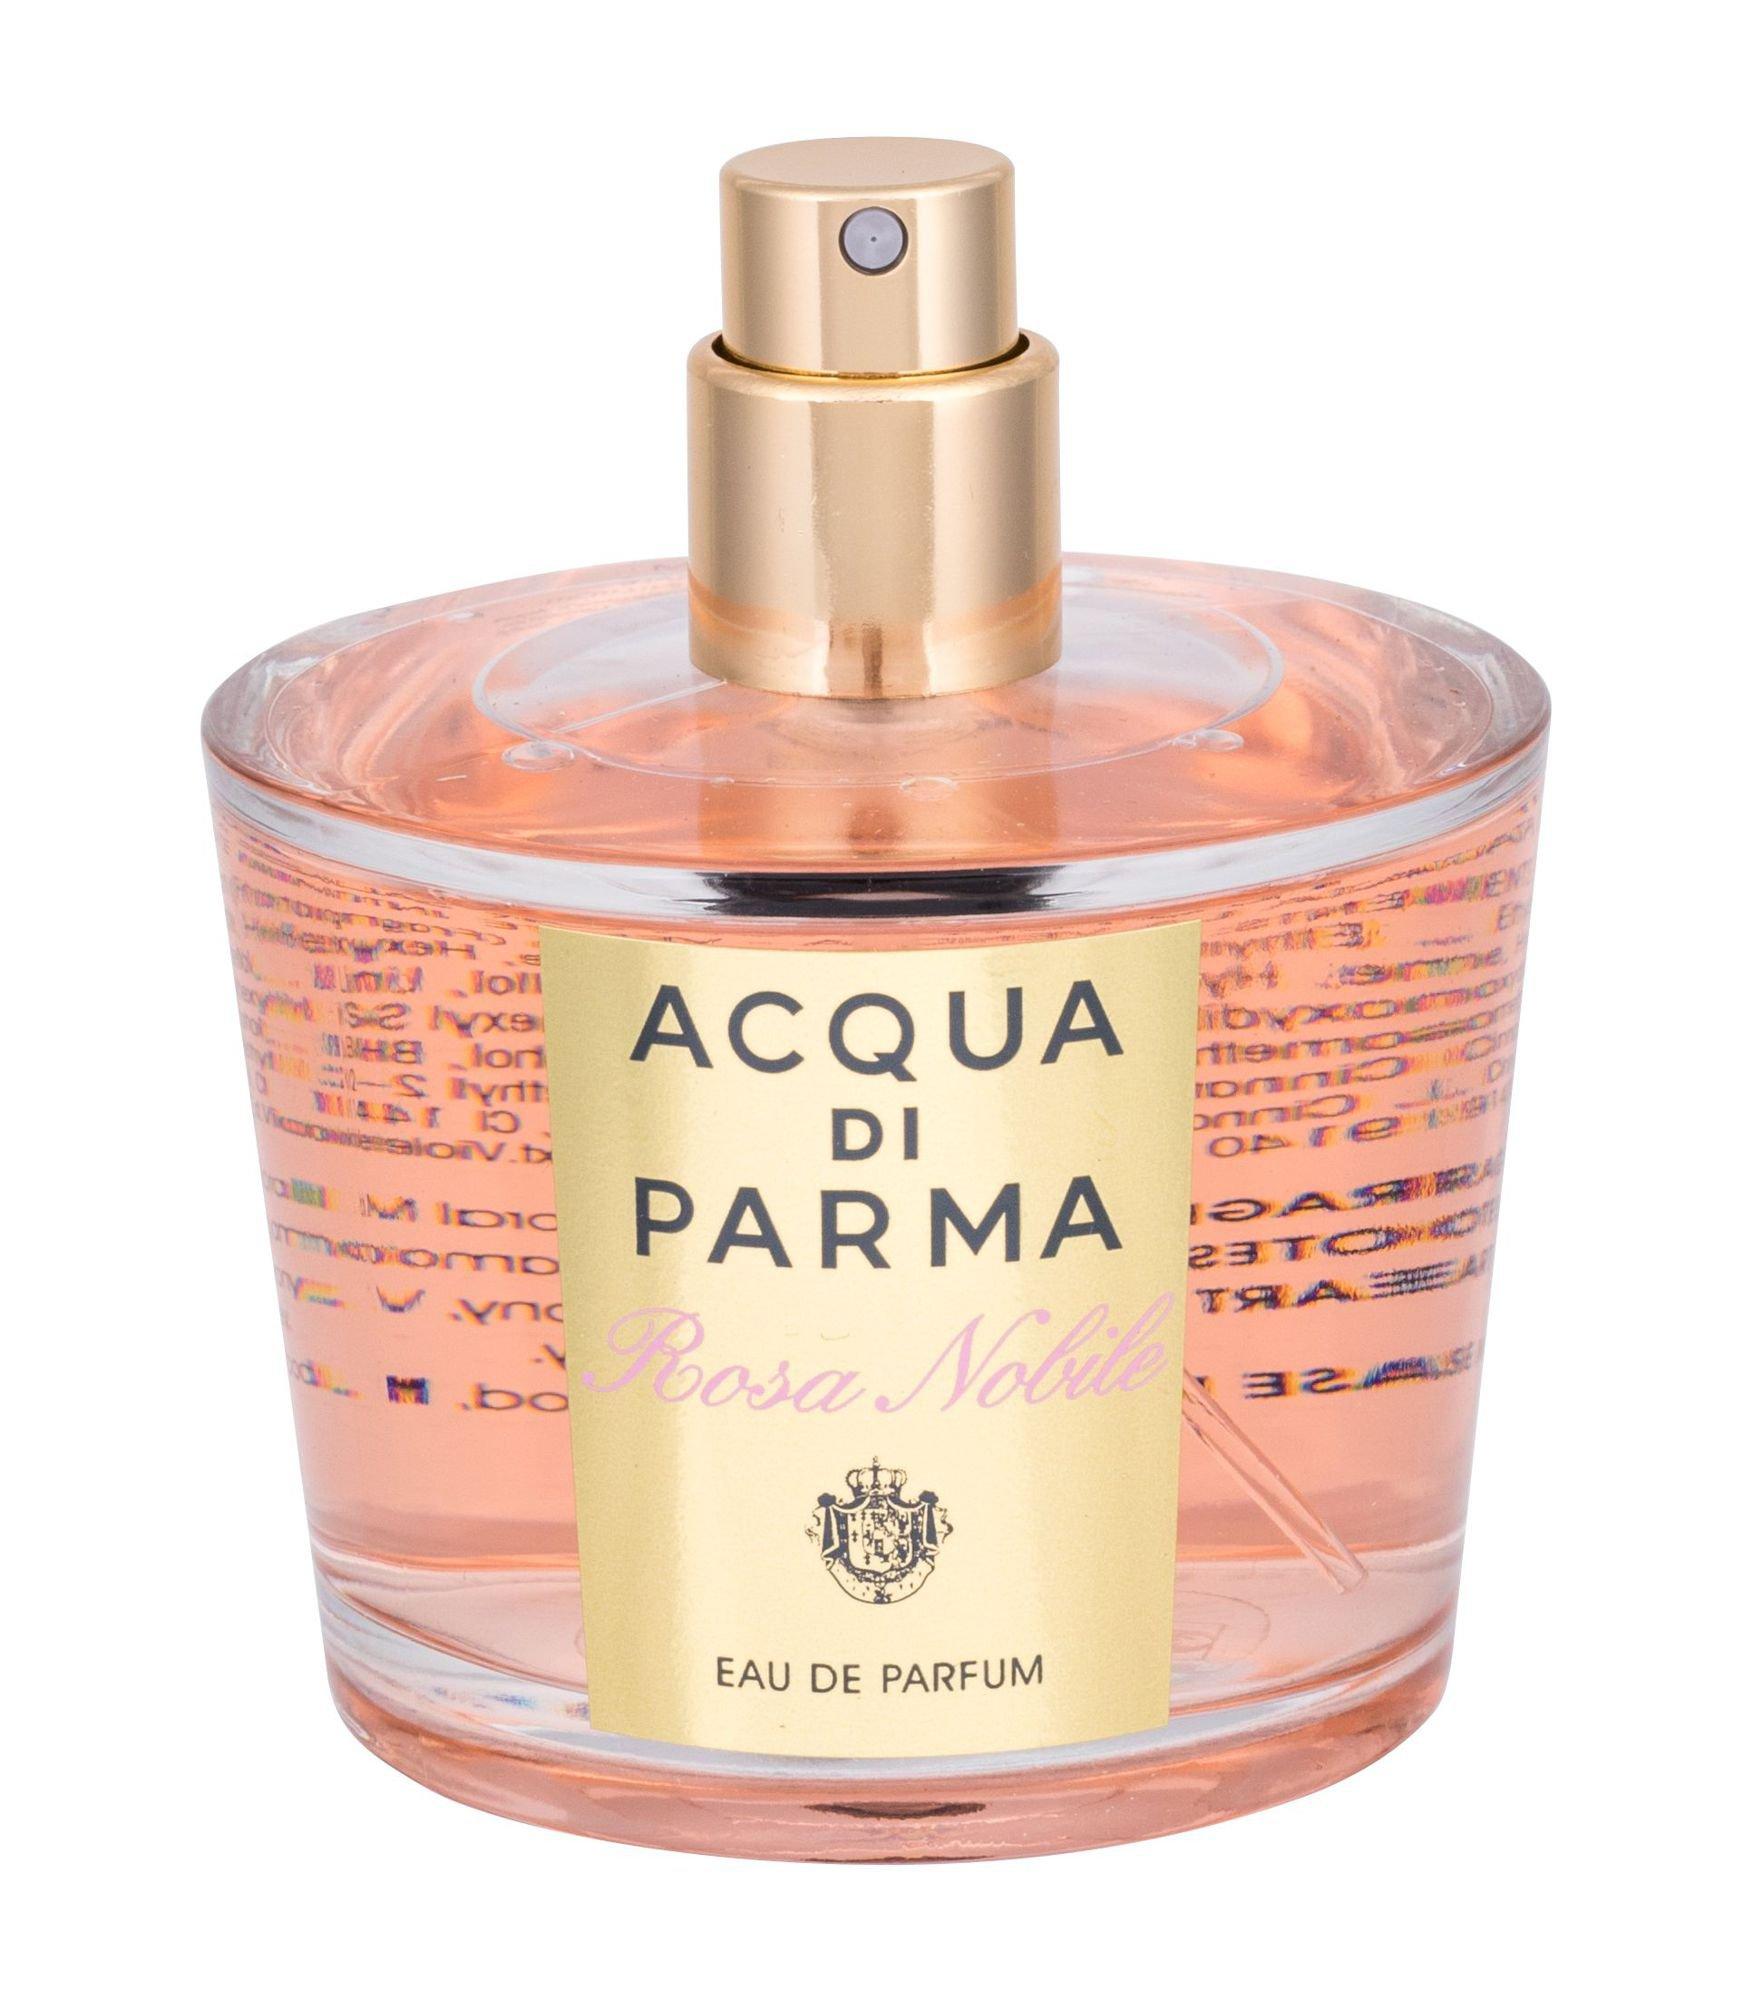 Acqua di Parma Rosa Nobile, Parfumovaná voda 100ml, Tester